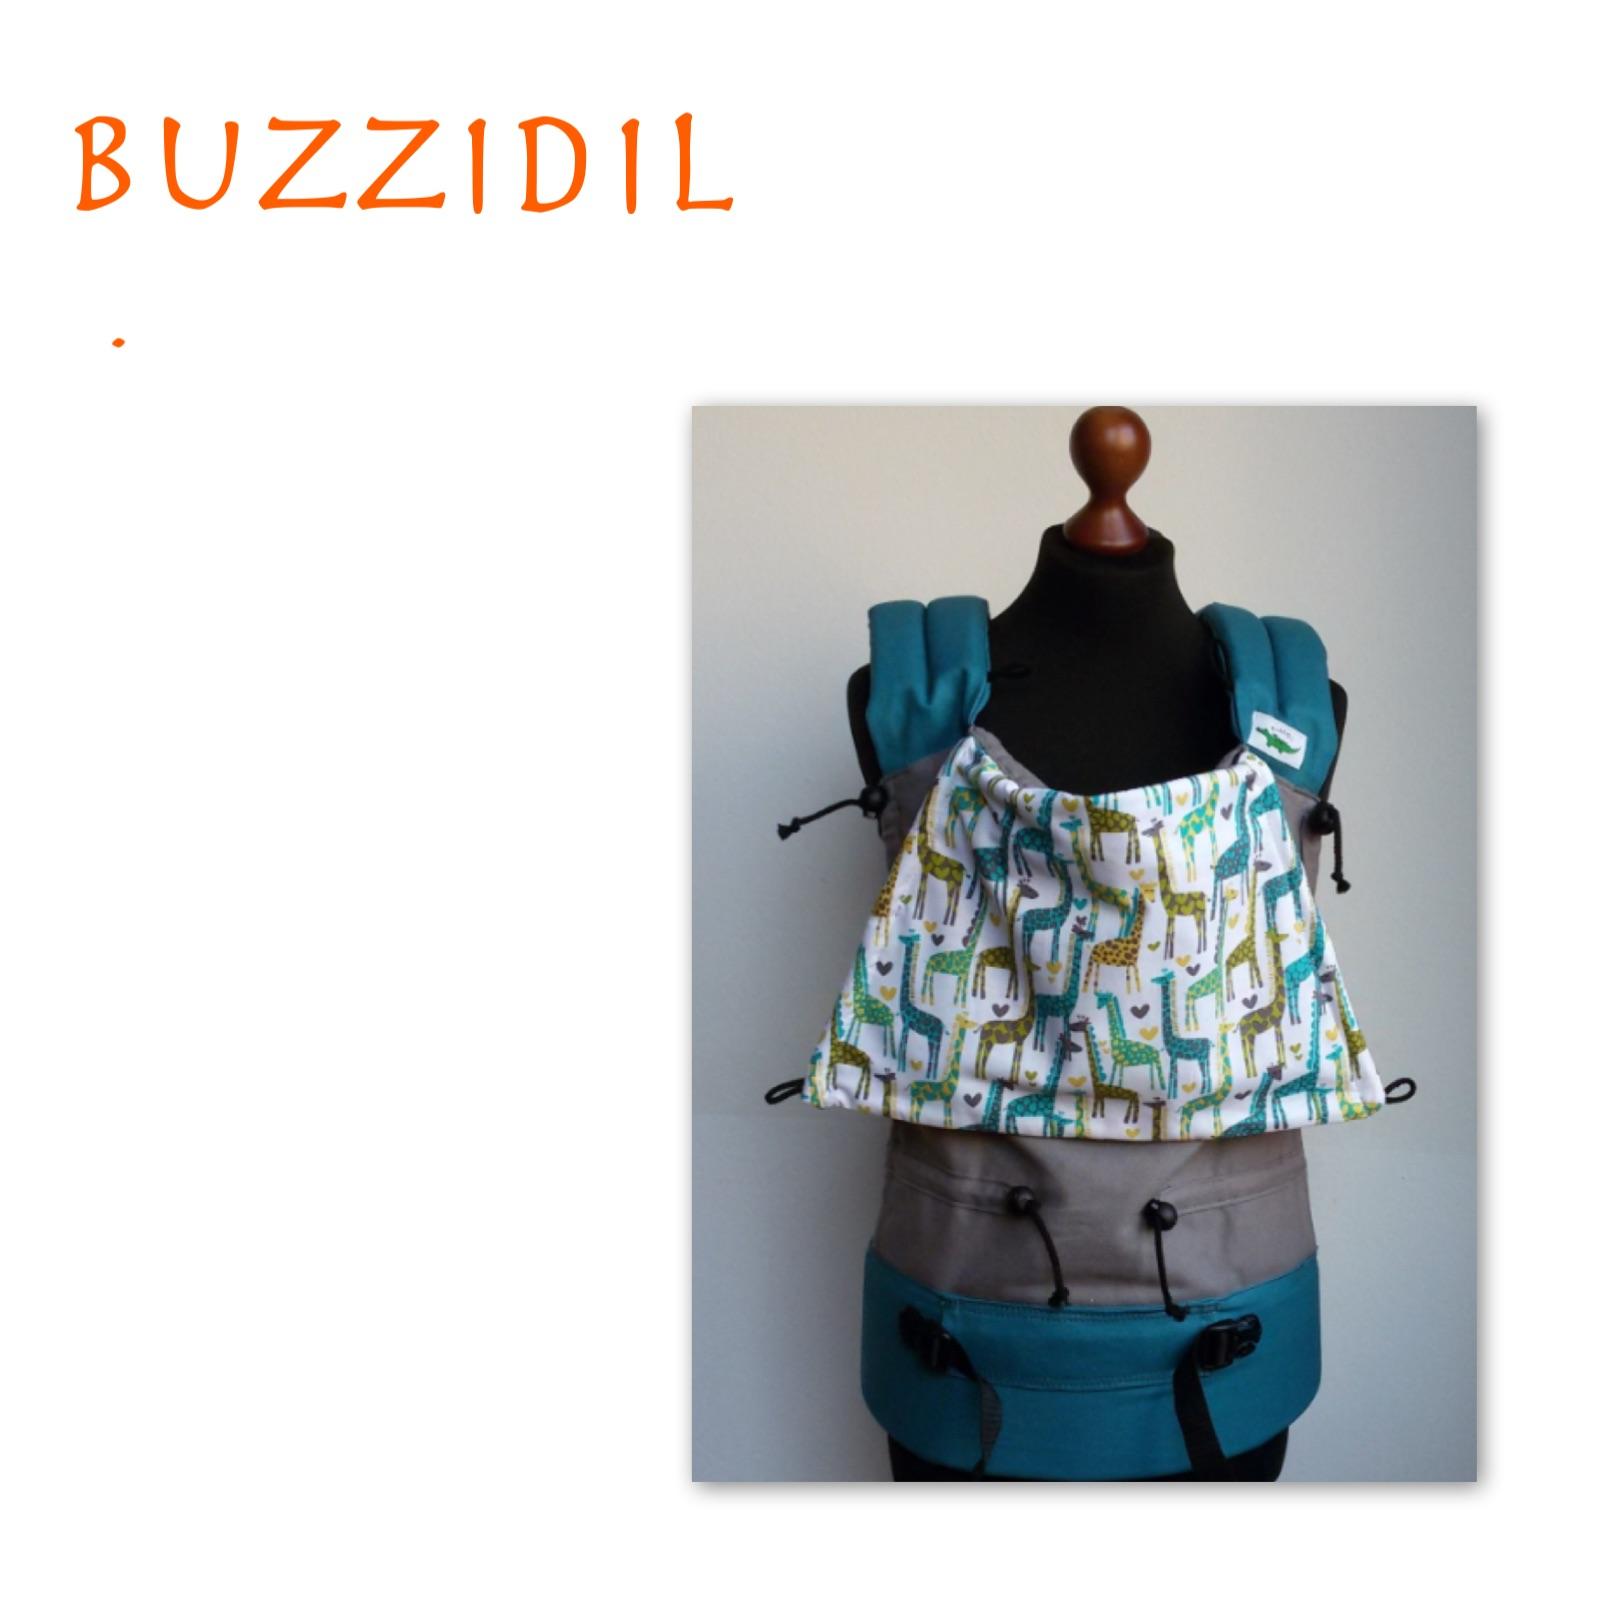 Buzzidil Versatile